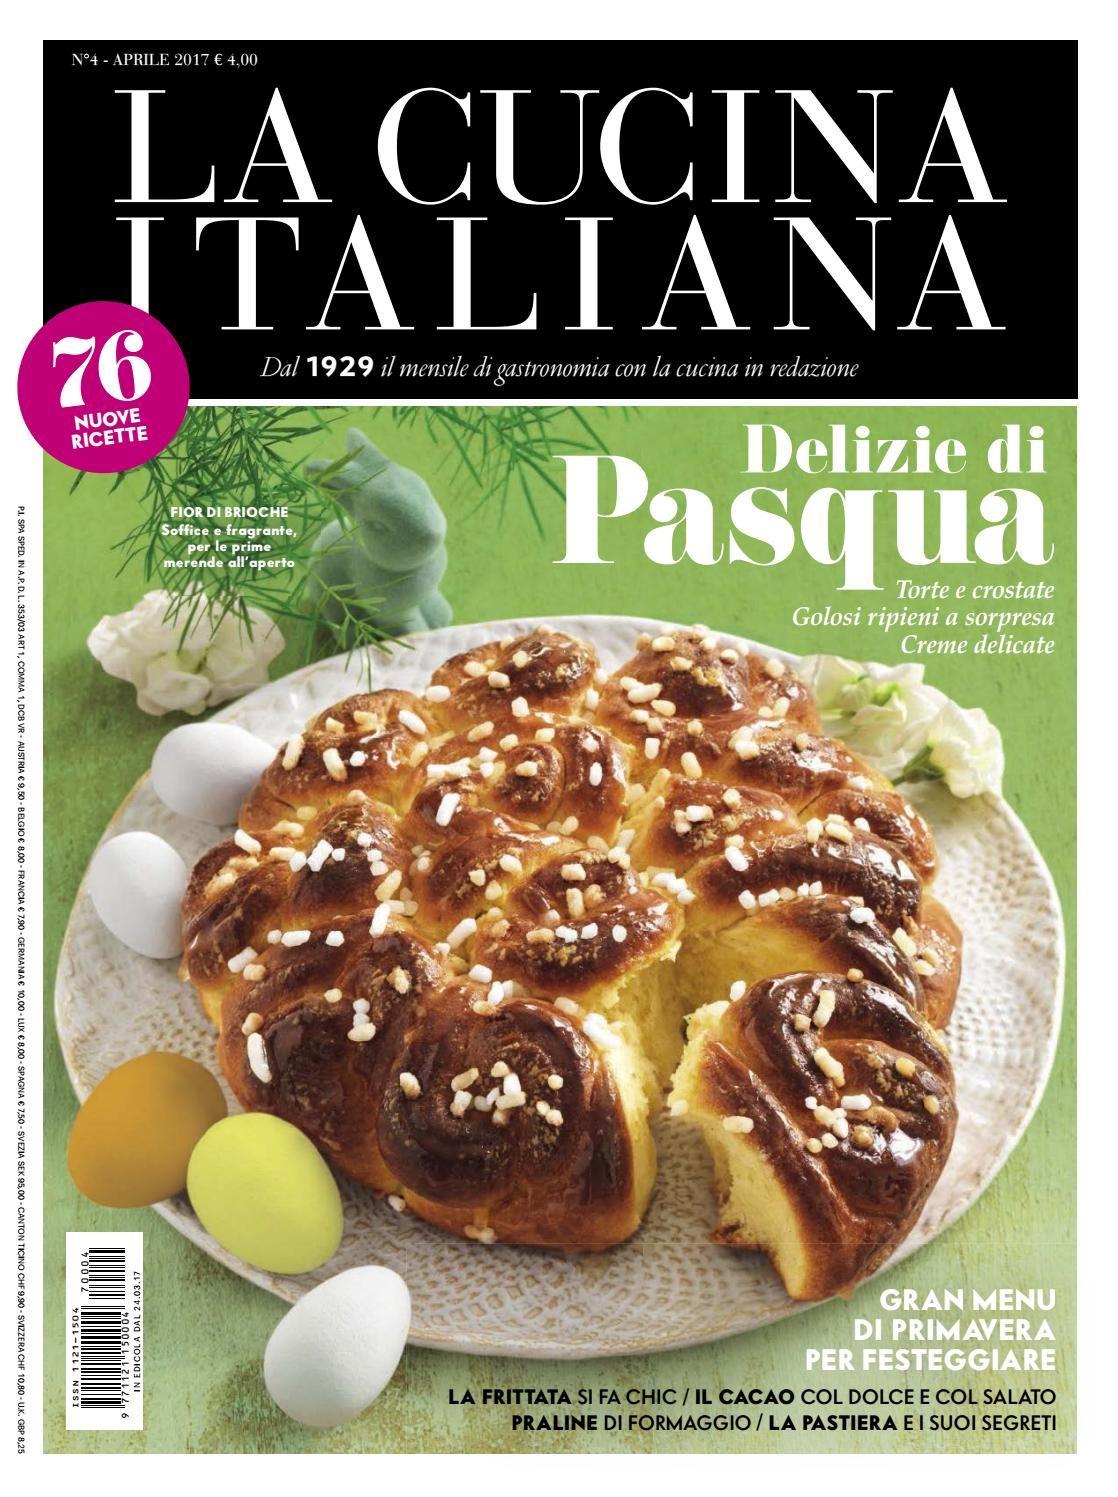 4c684b514c1e33a1f2312e8a2d80ae4a - La Cucina Italiana Ricette